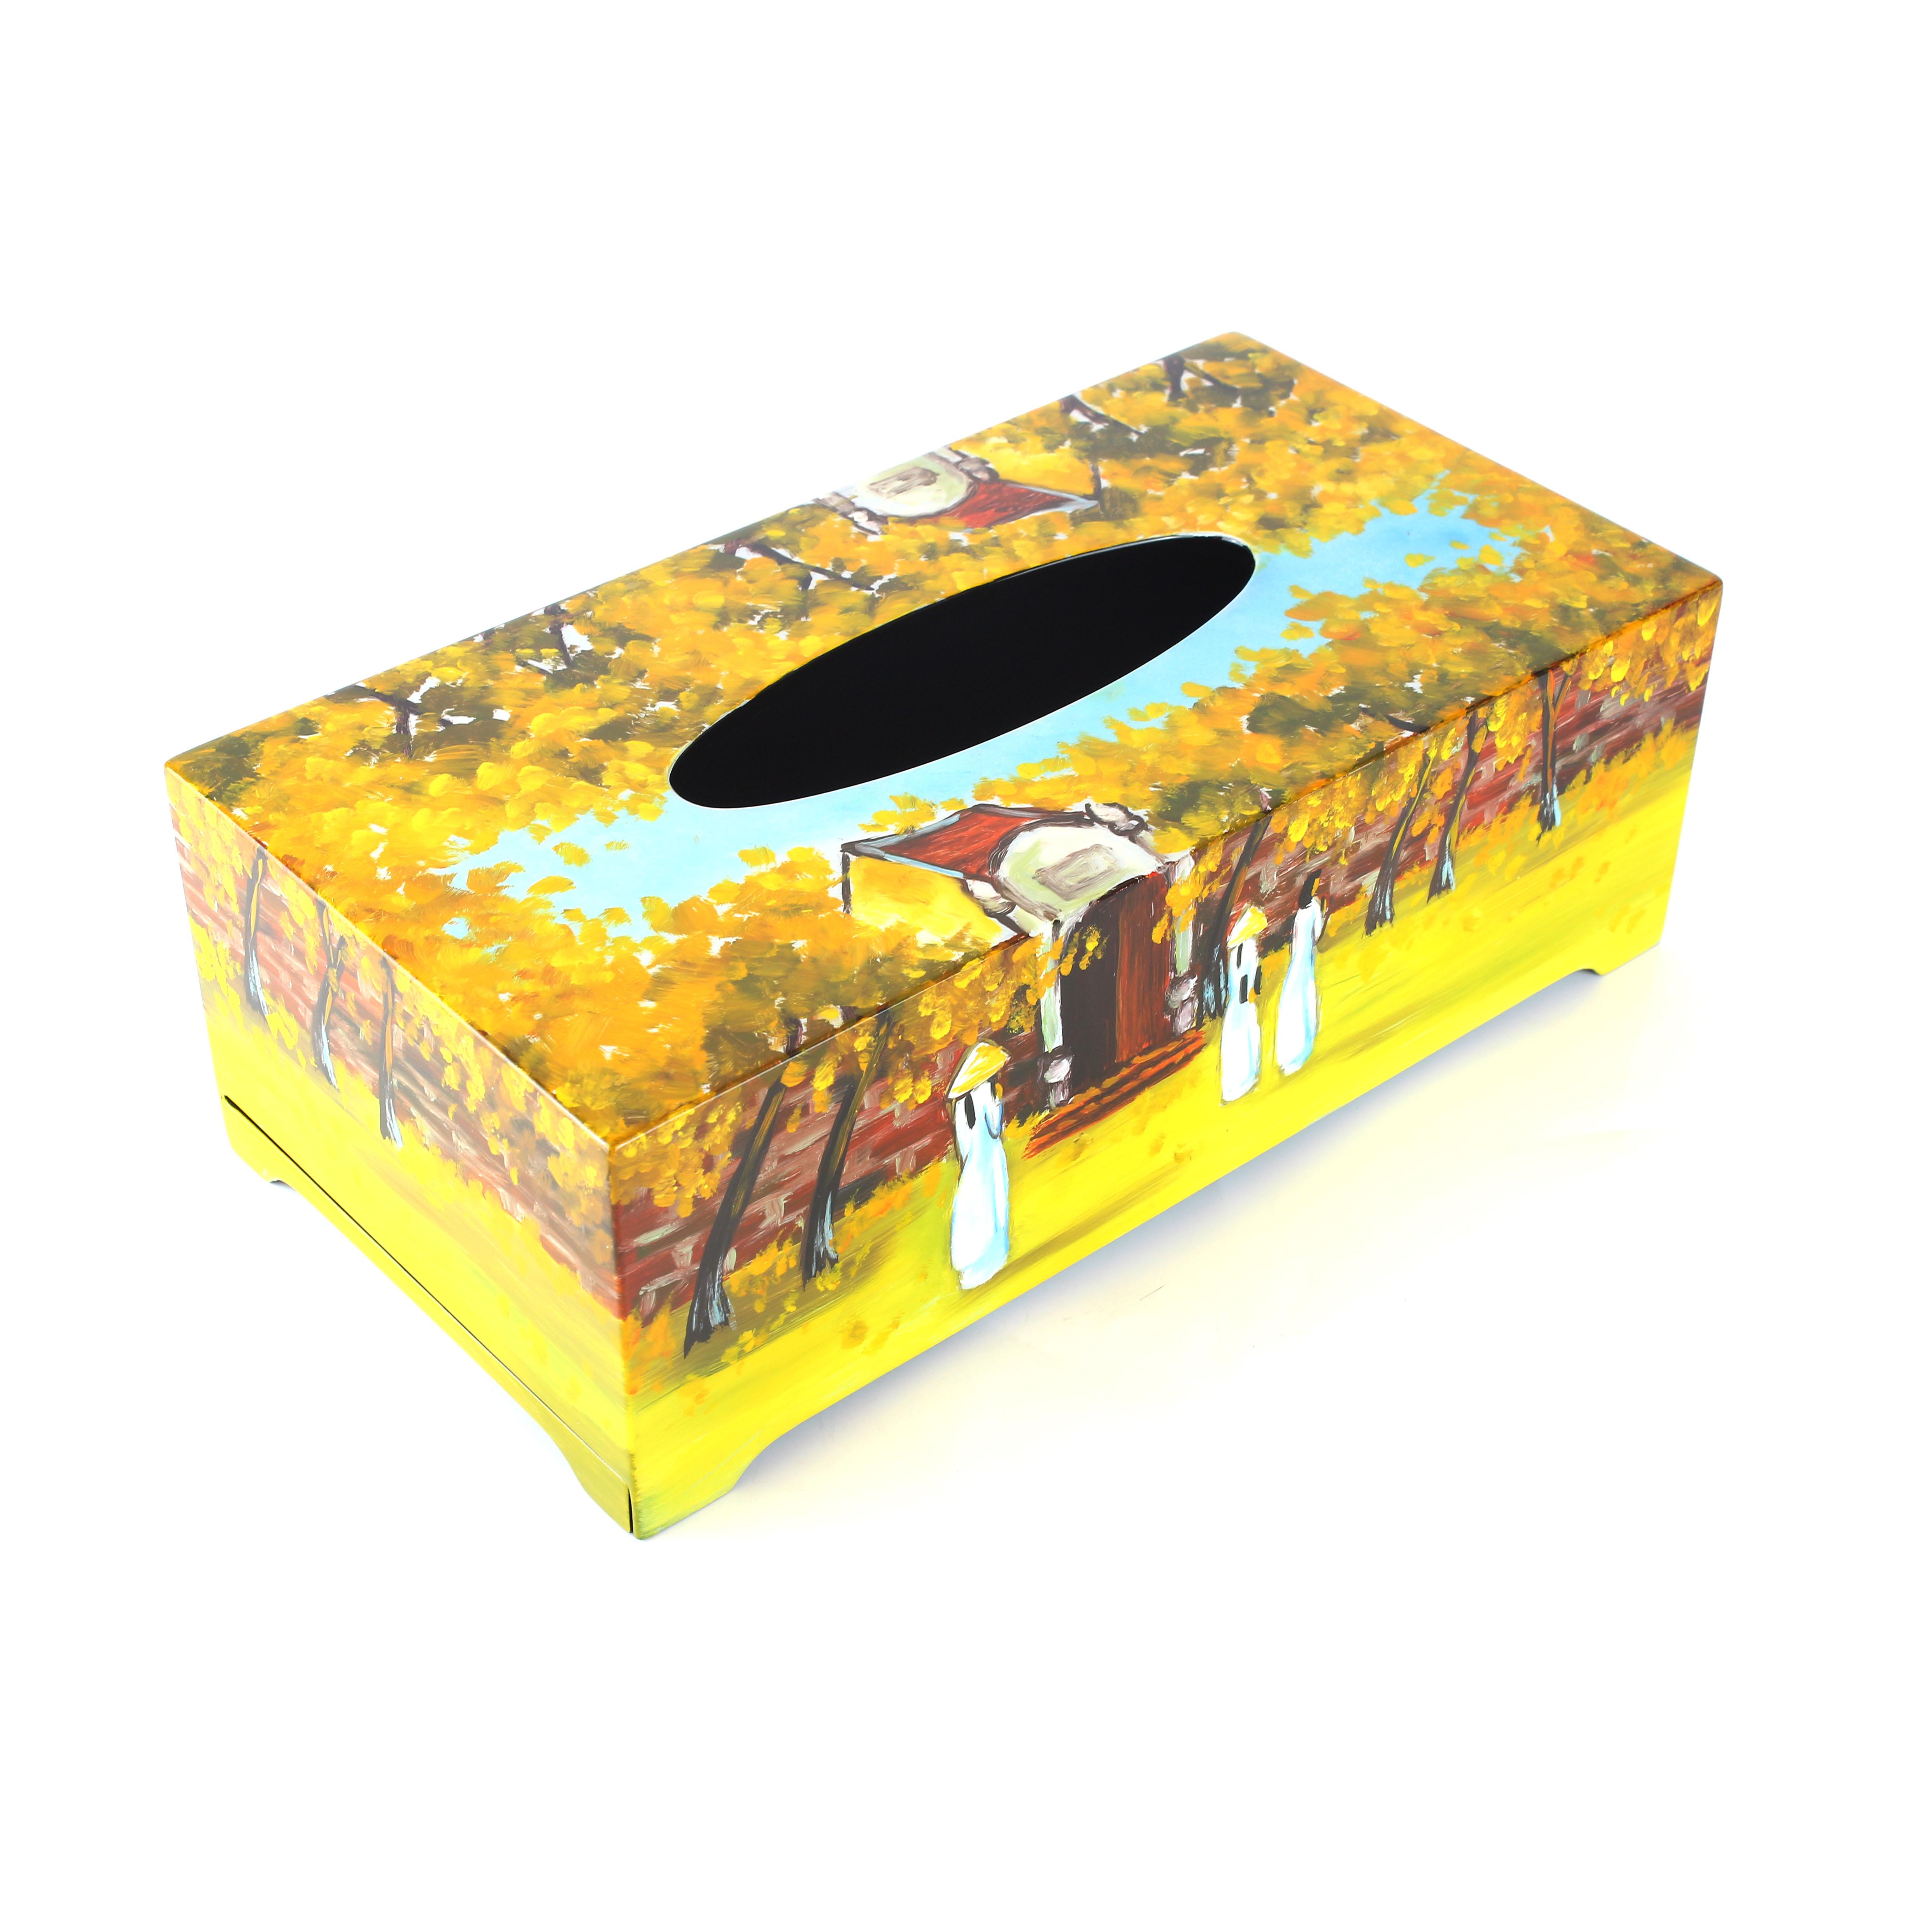 Vietnam Tissue Box